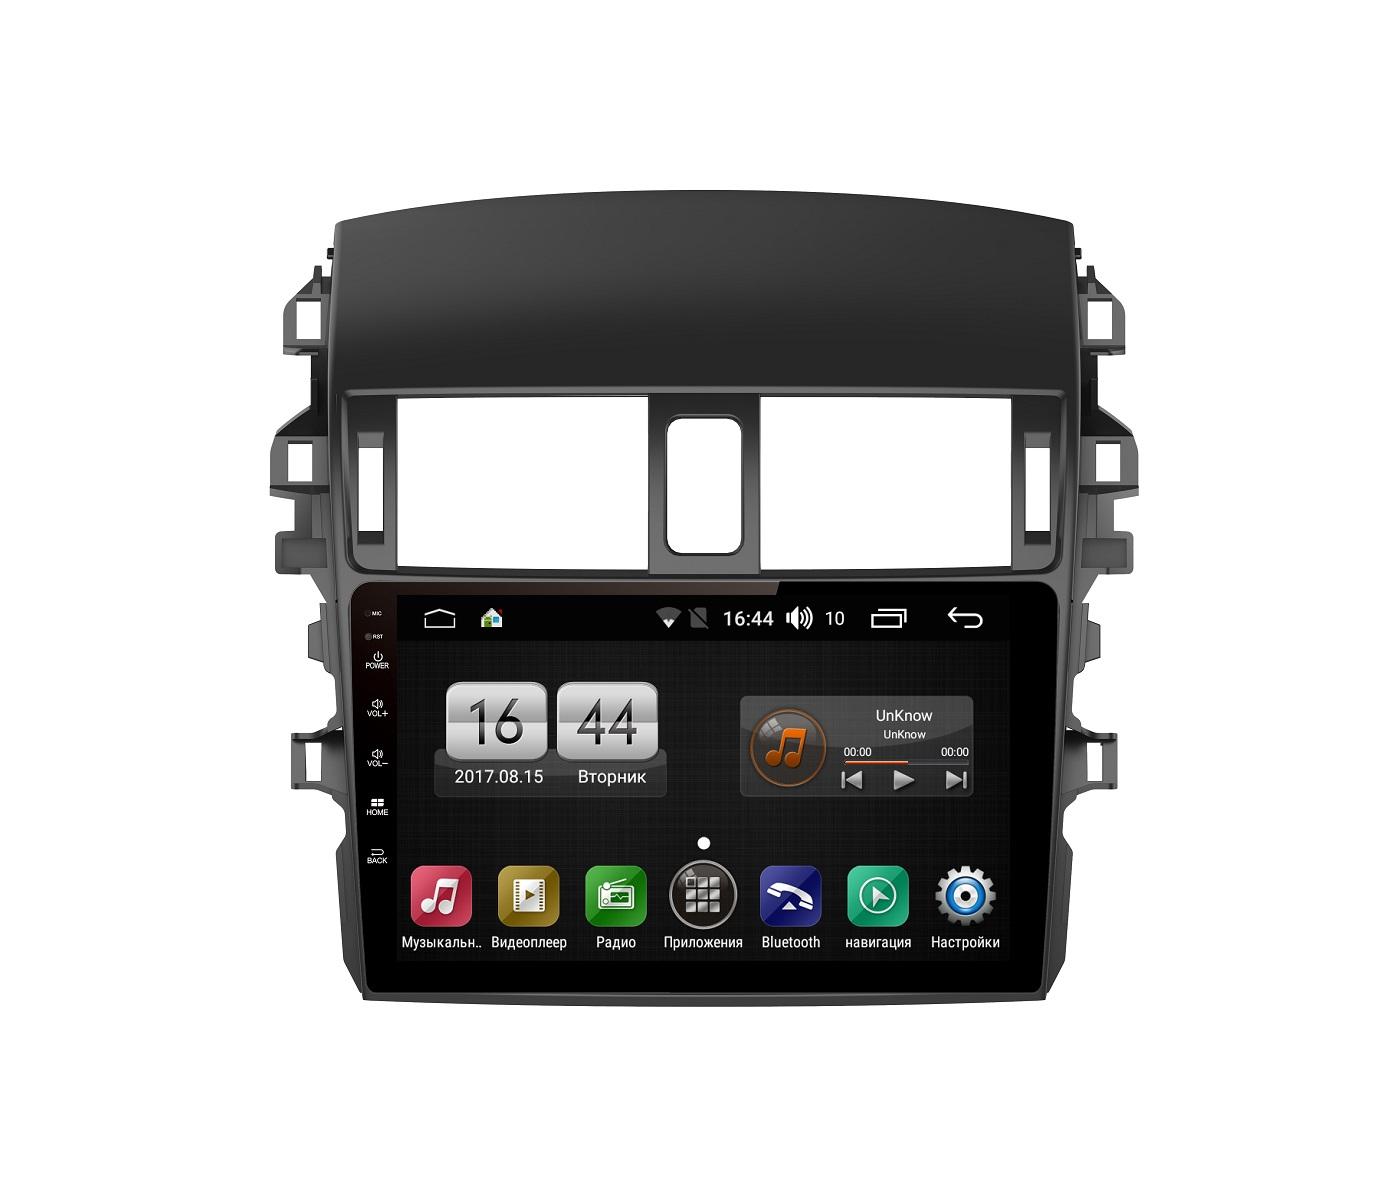 Штатная магнитола FarCar s175 для Toyota Corolla на Android (L063R) штатная магнитола farcar s175 для toyota camry на android l064r